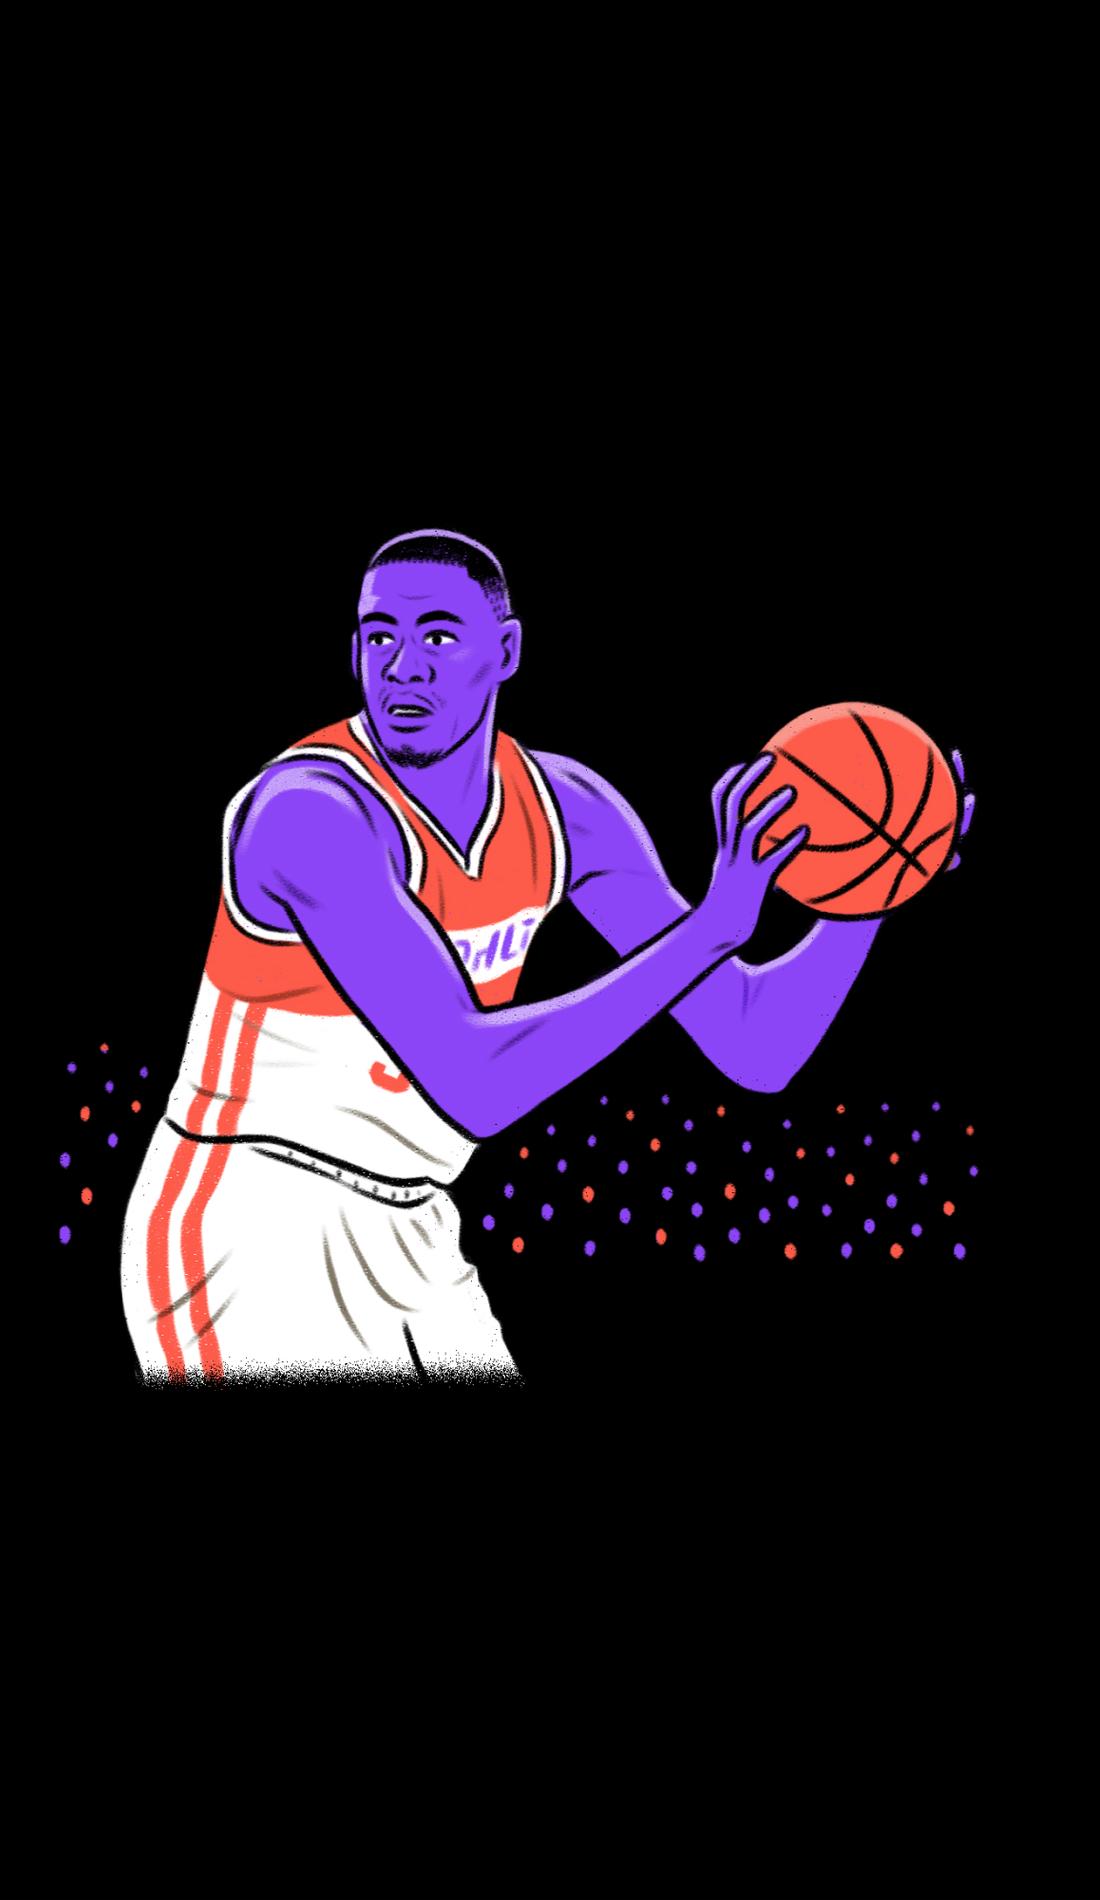 A UNC Asheville Bulldogs Basketball live event